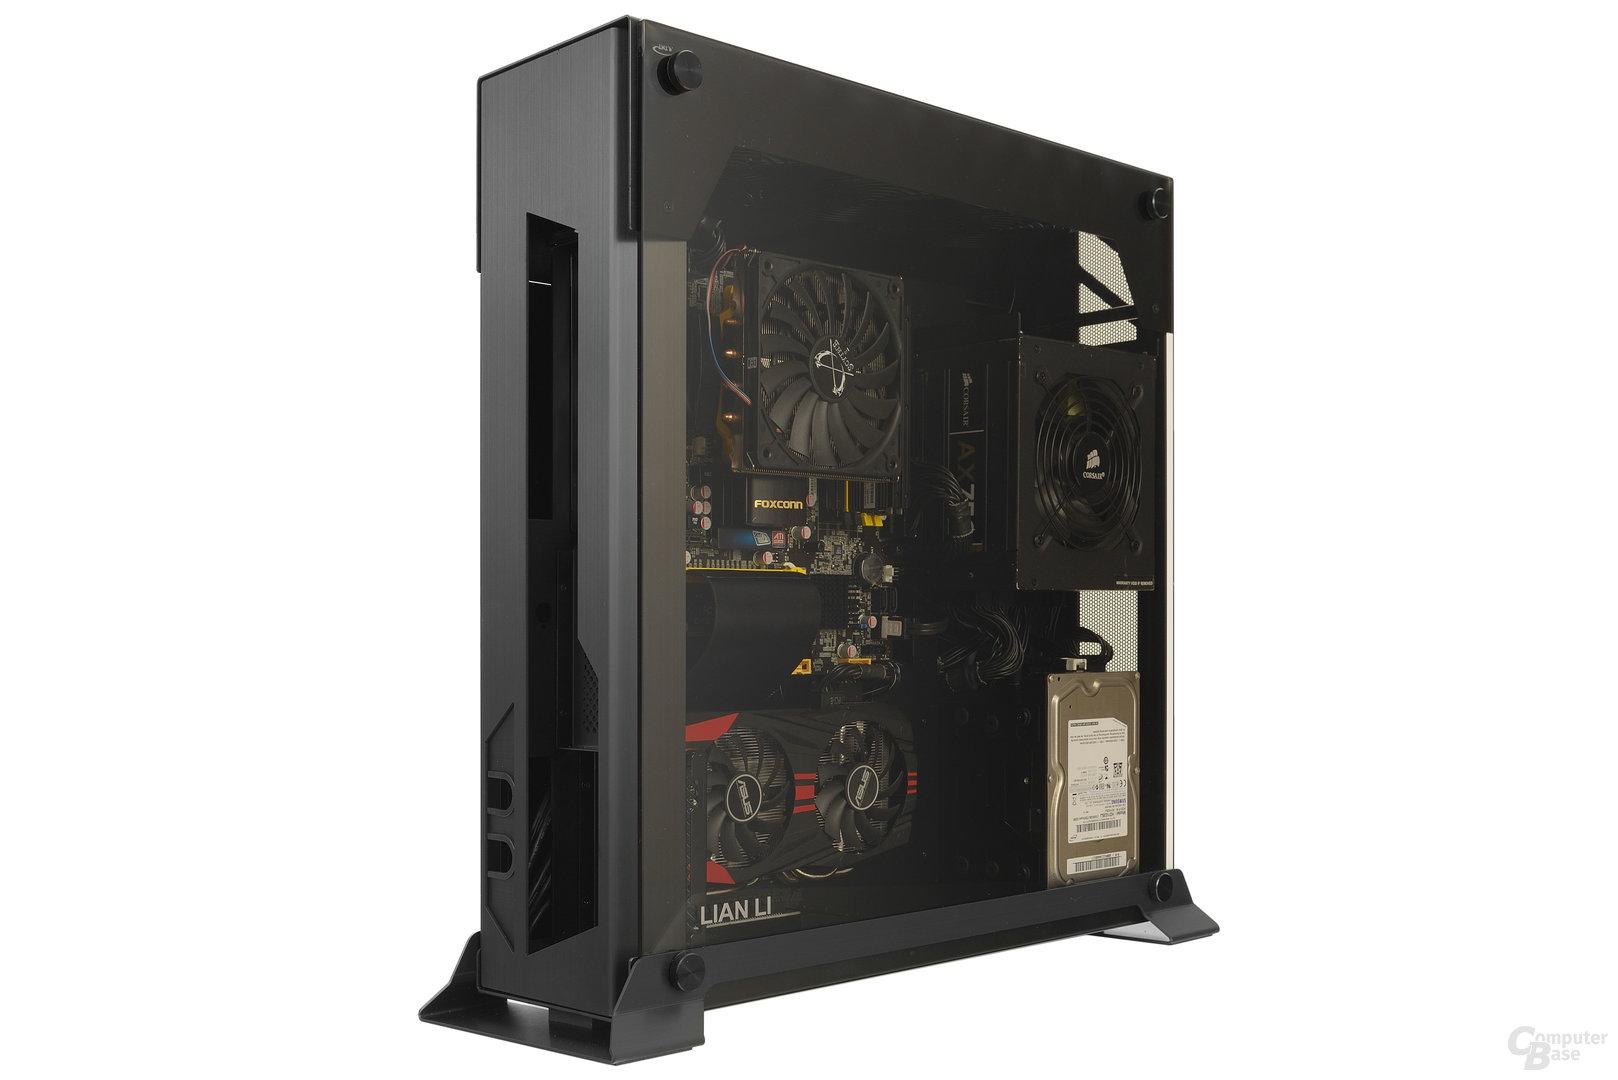 Lian Li PC-O6S – Testsystem mit Sichtfenster